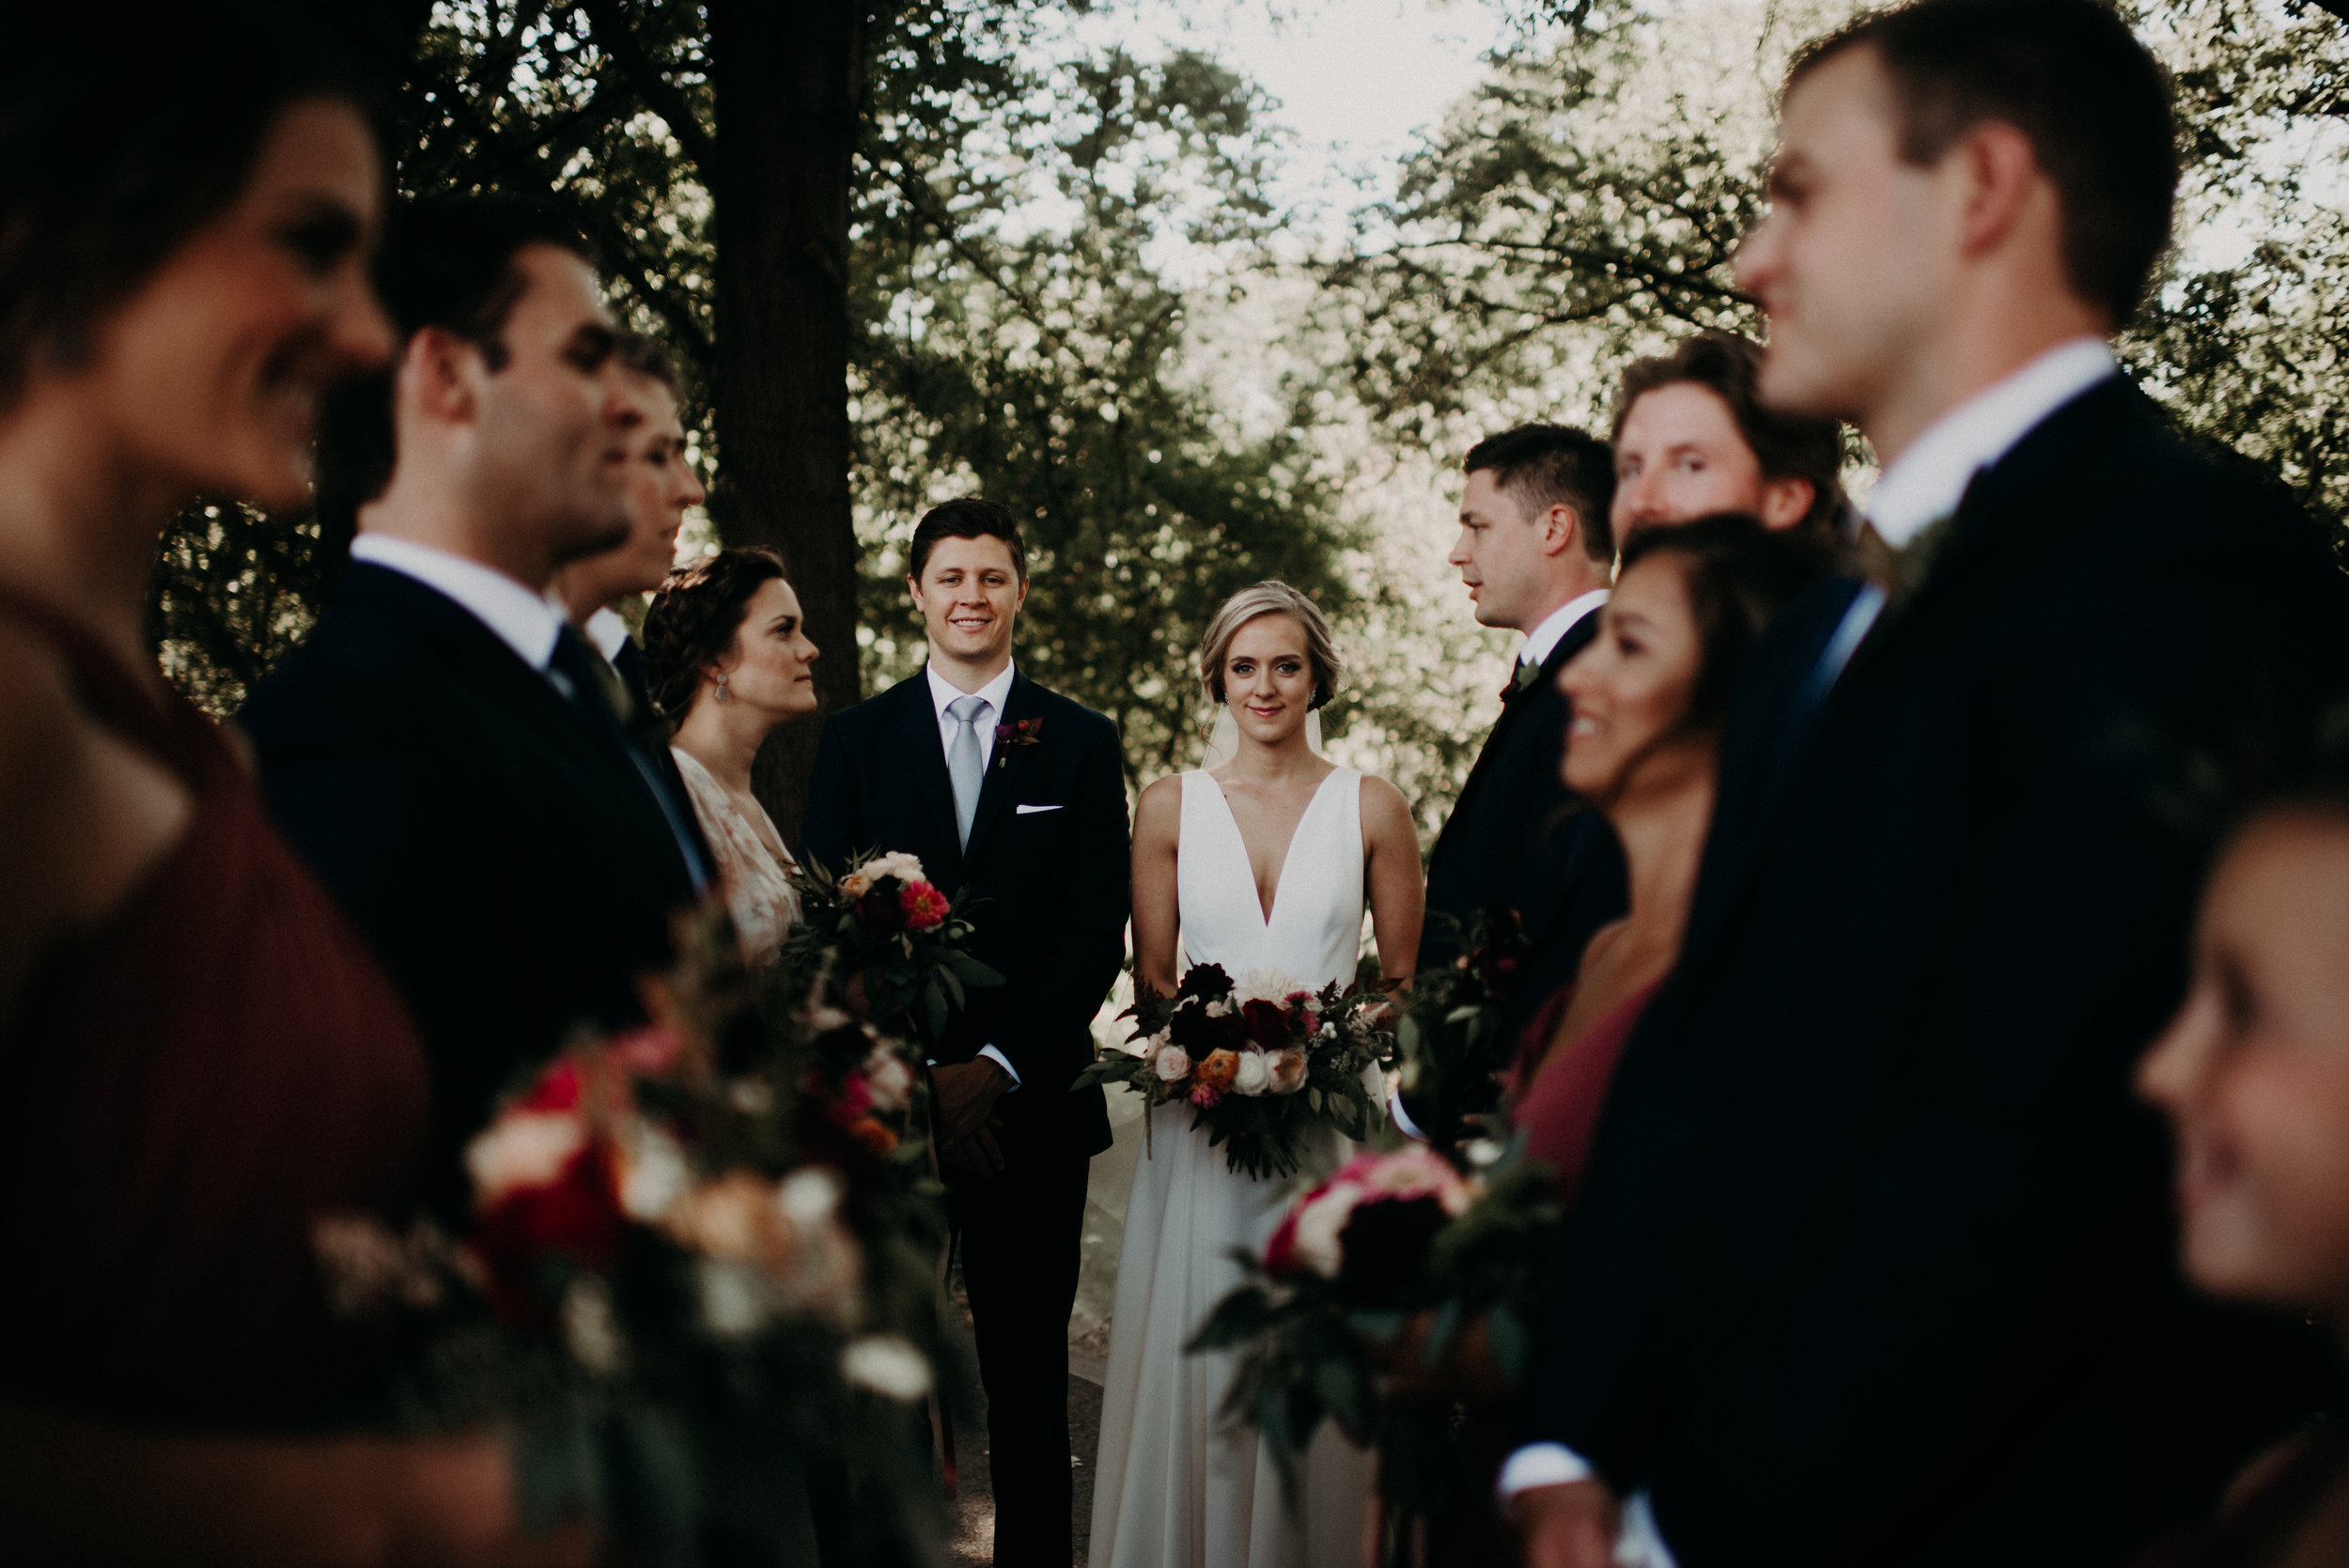 Annie_Sam_Married-221.jpg